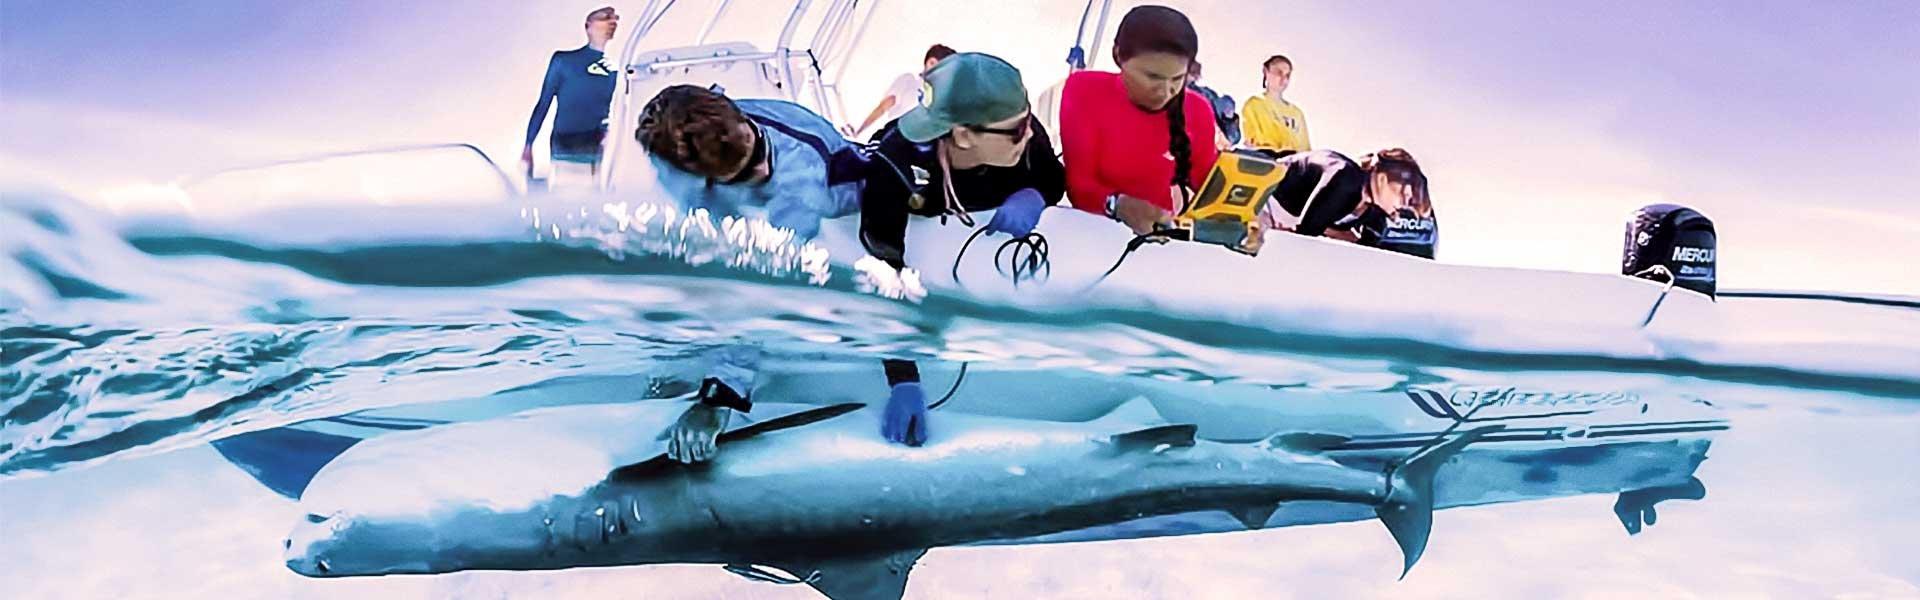 bimini-shark-lab-web-v2